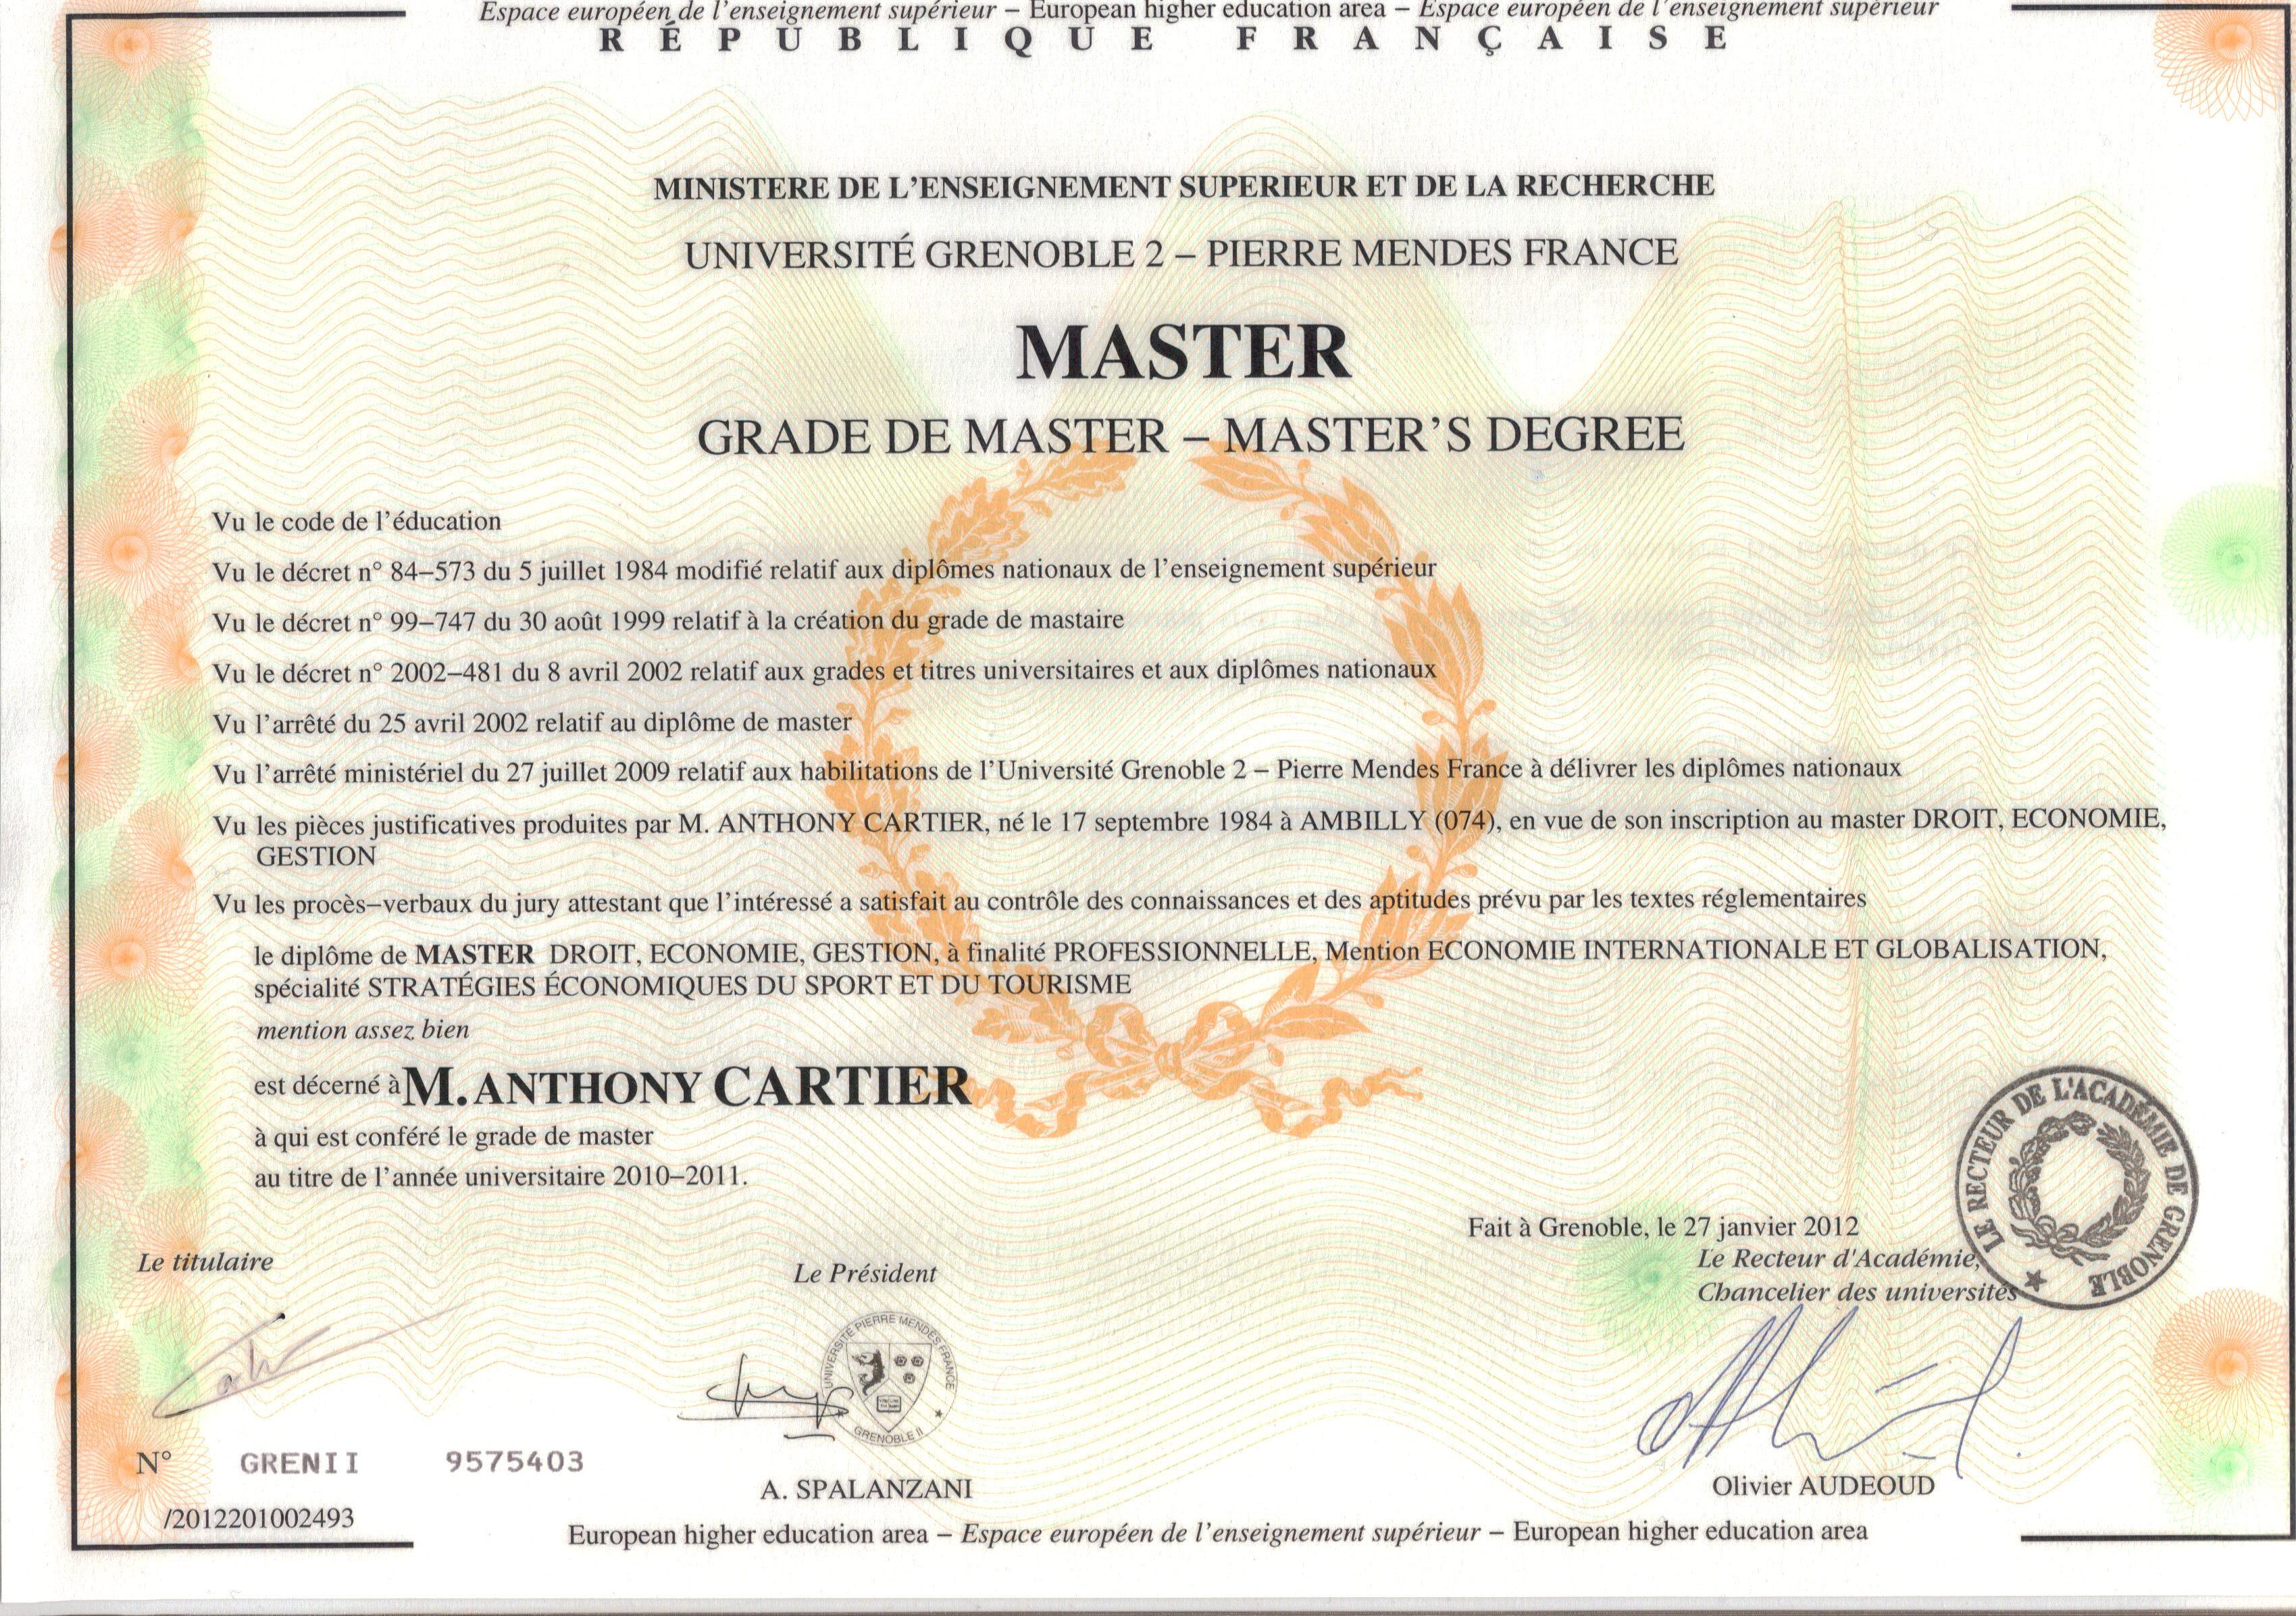 diplome de master